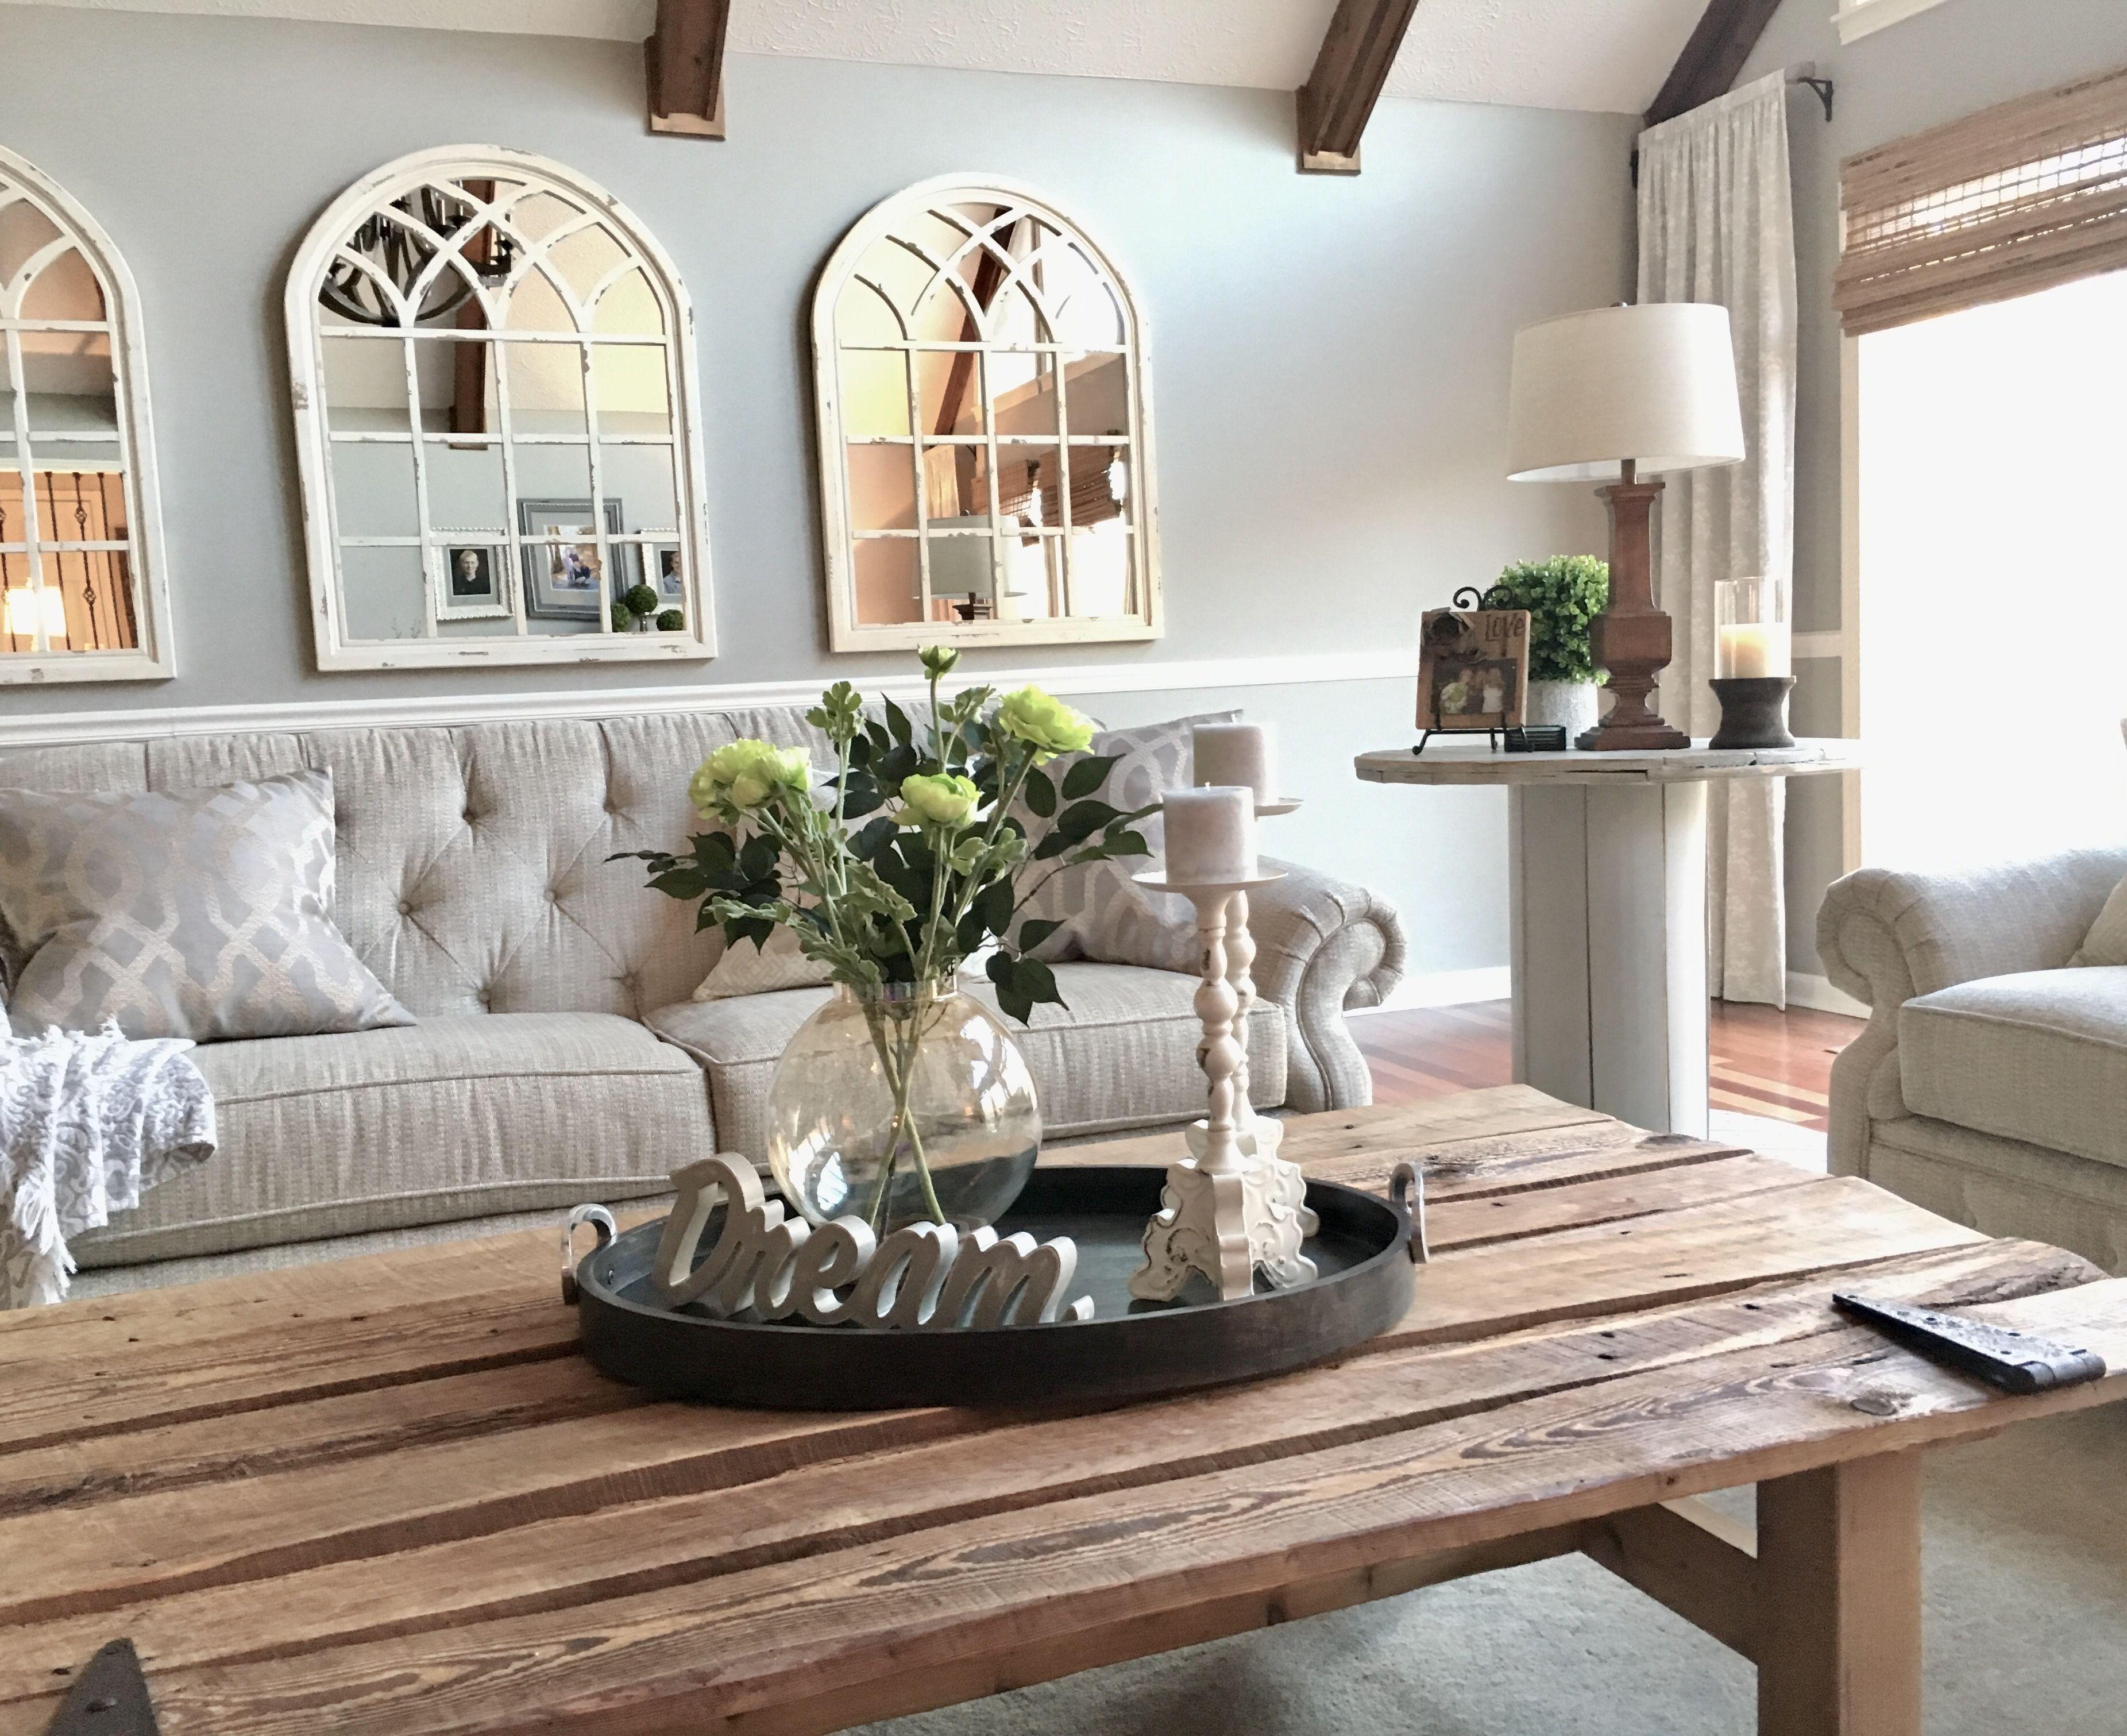 Farmhouse barn door coffee table. Easy diy project! in 2019 | Door coffee tables, Dinning room ...